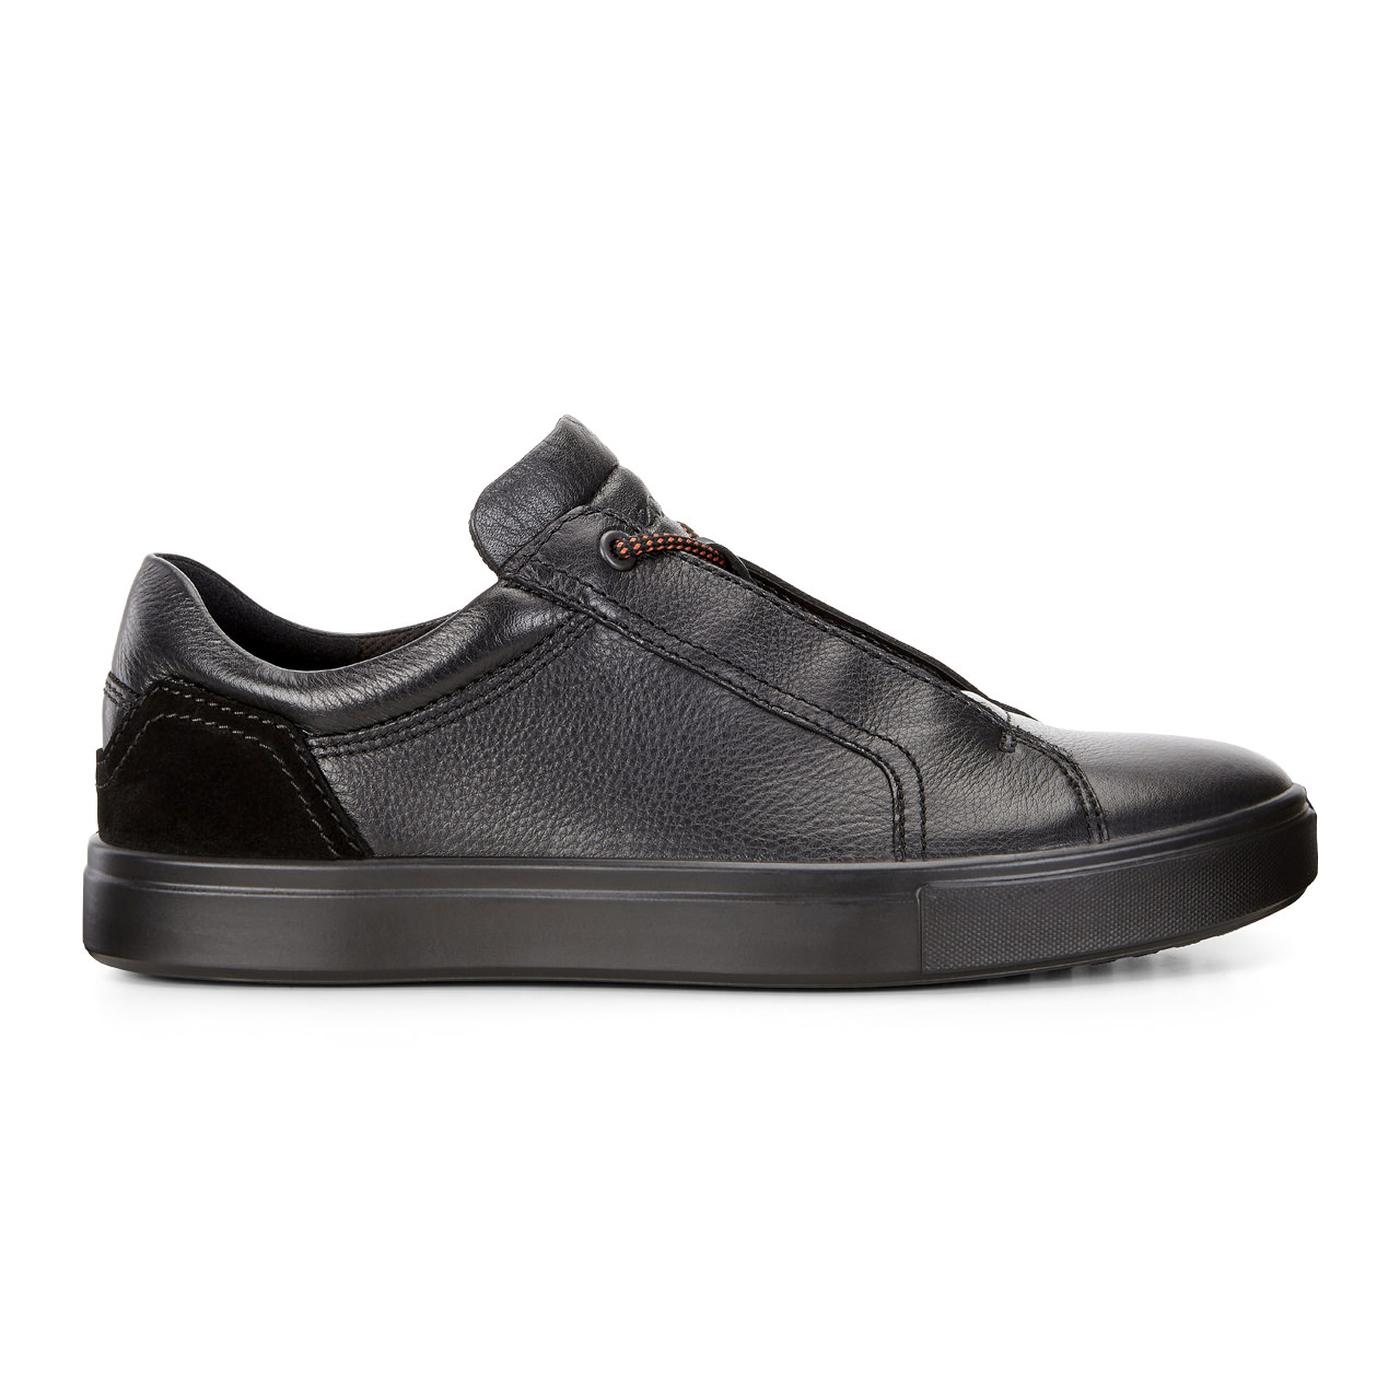 45bf4f533f6b ECCO Kyle Street Sneaker